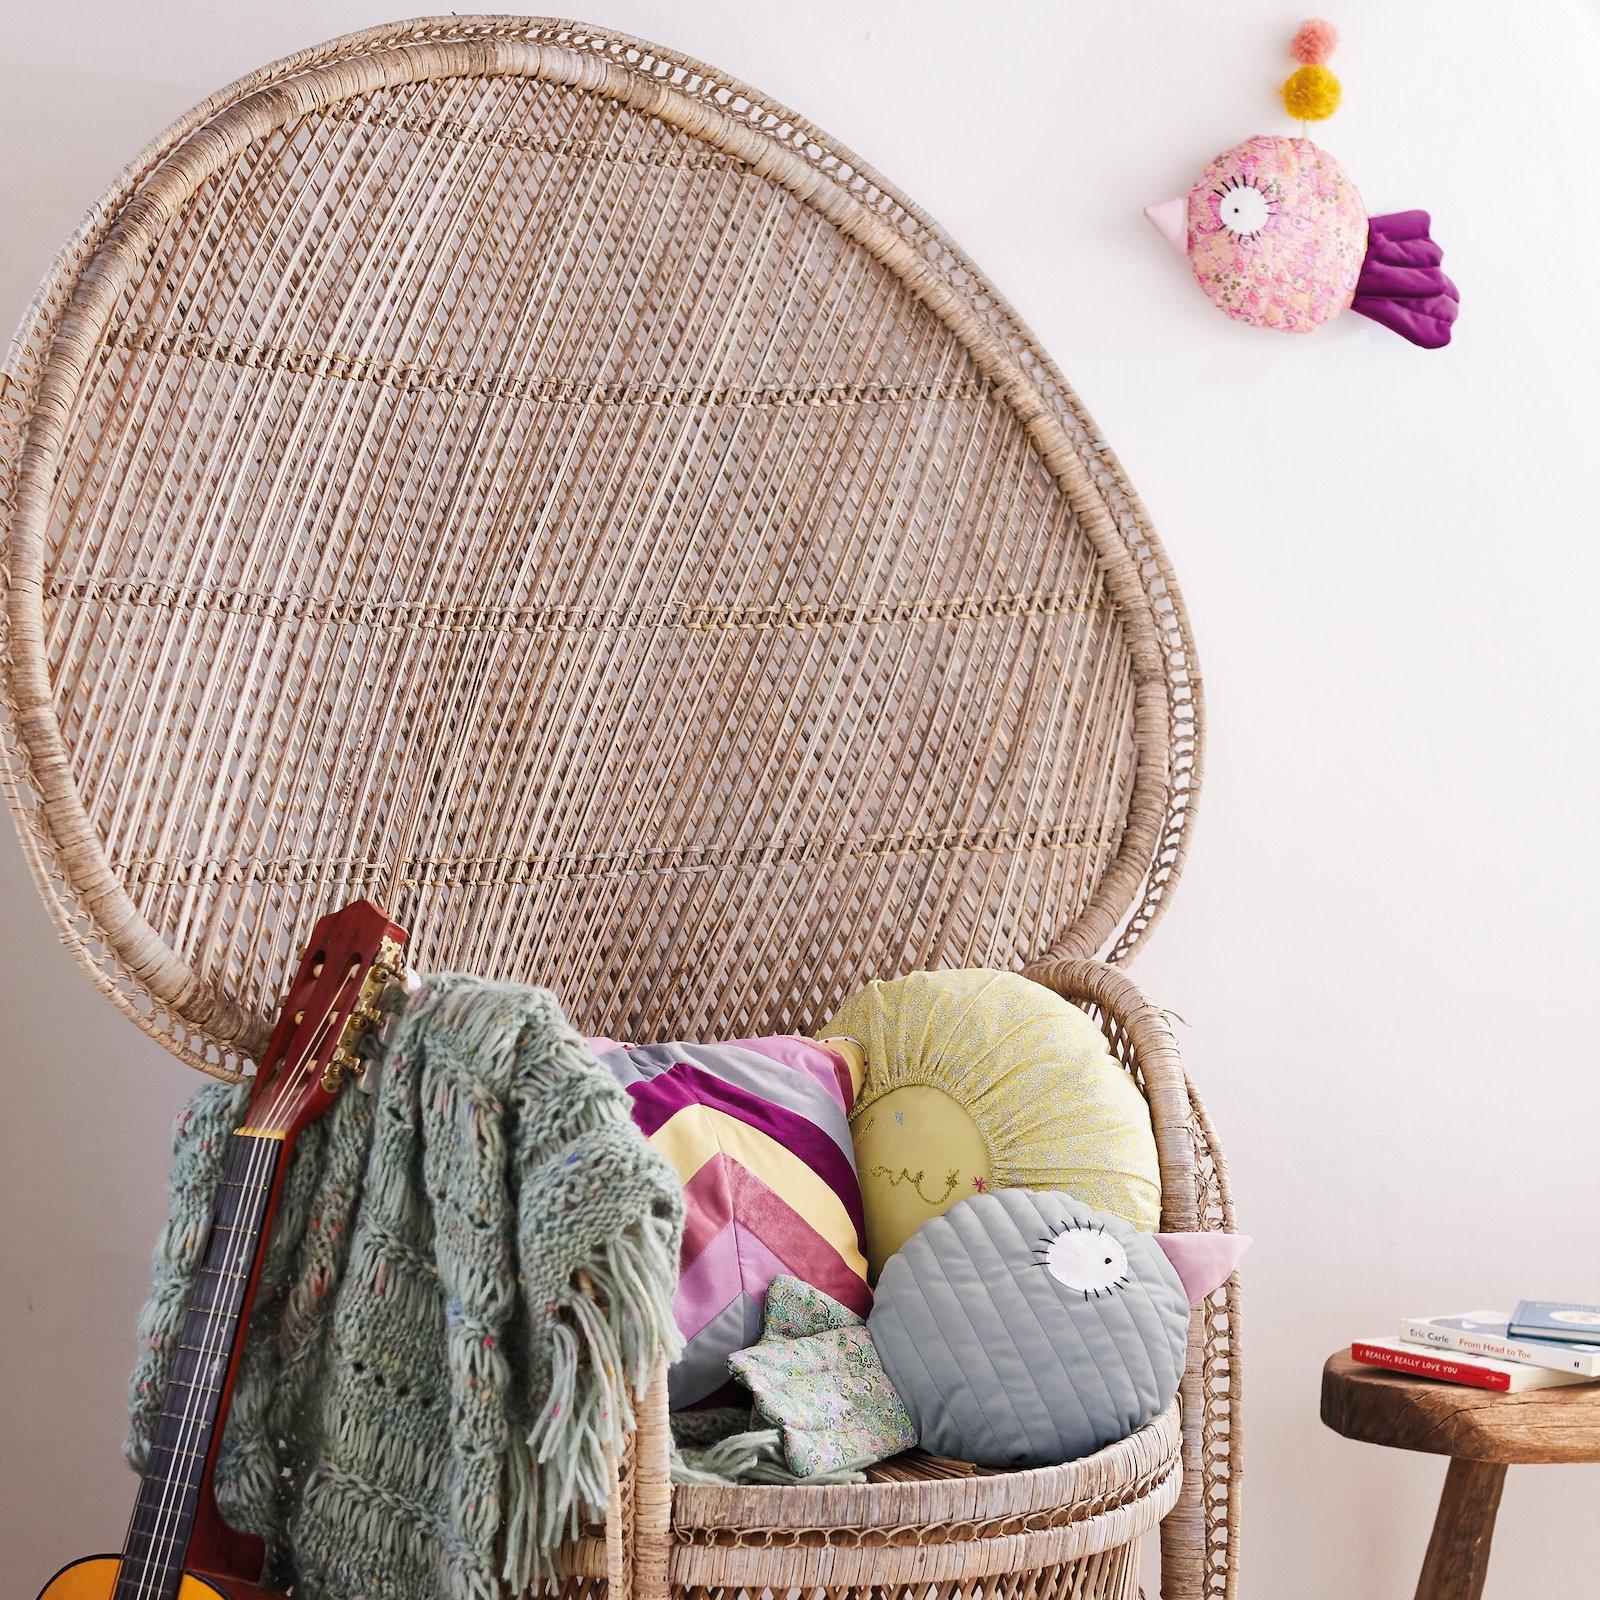 Upholstery shiny velvet pastel blue p90338_852367_823763_4350_90066309_90066335_824042_4359_4357_bundle